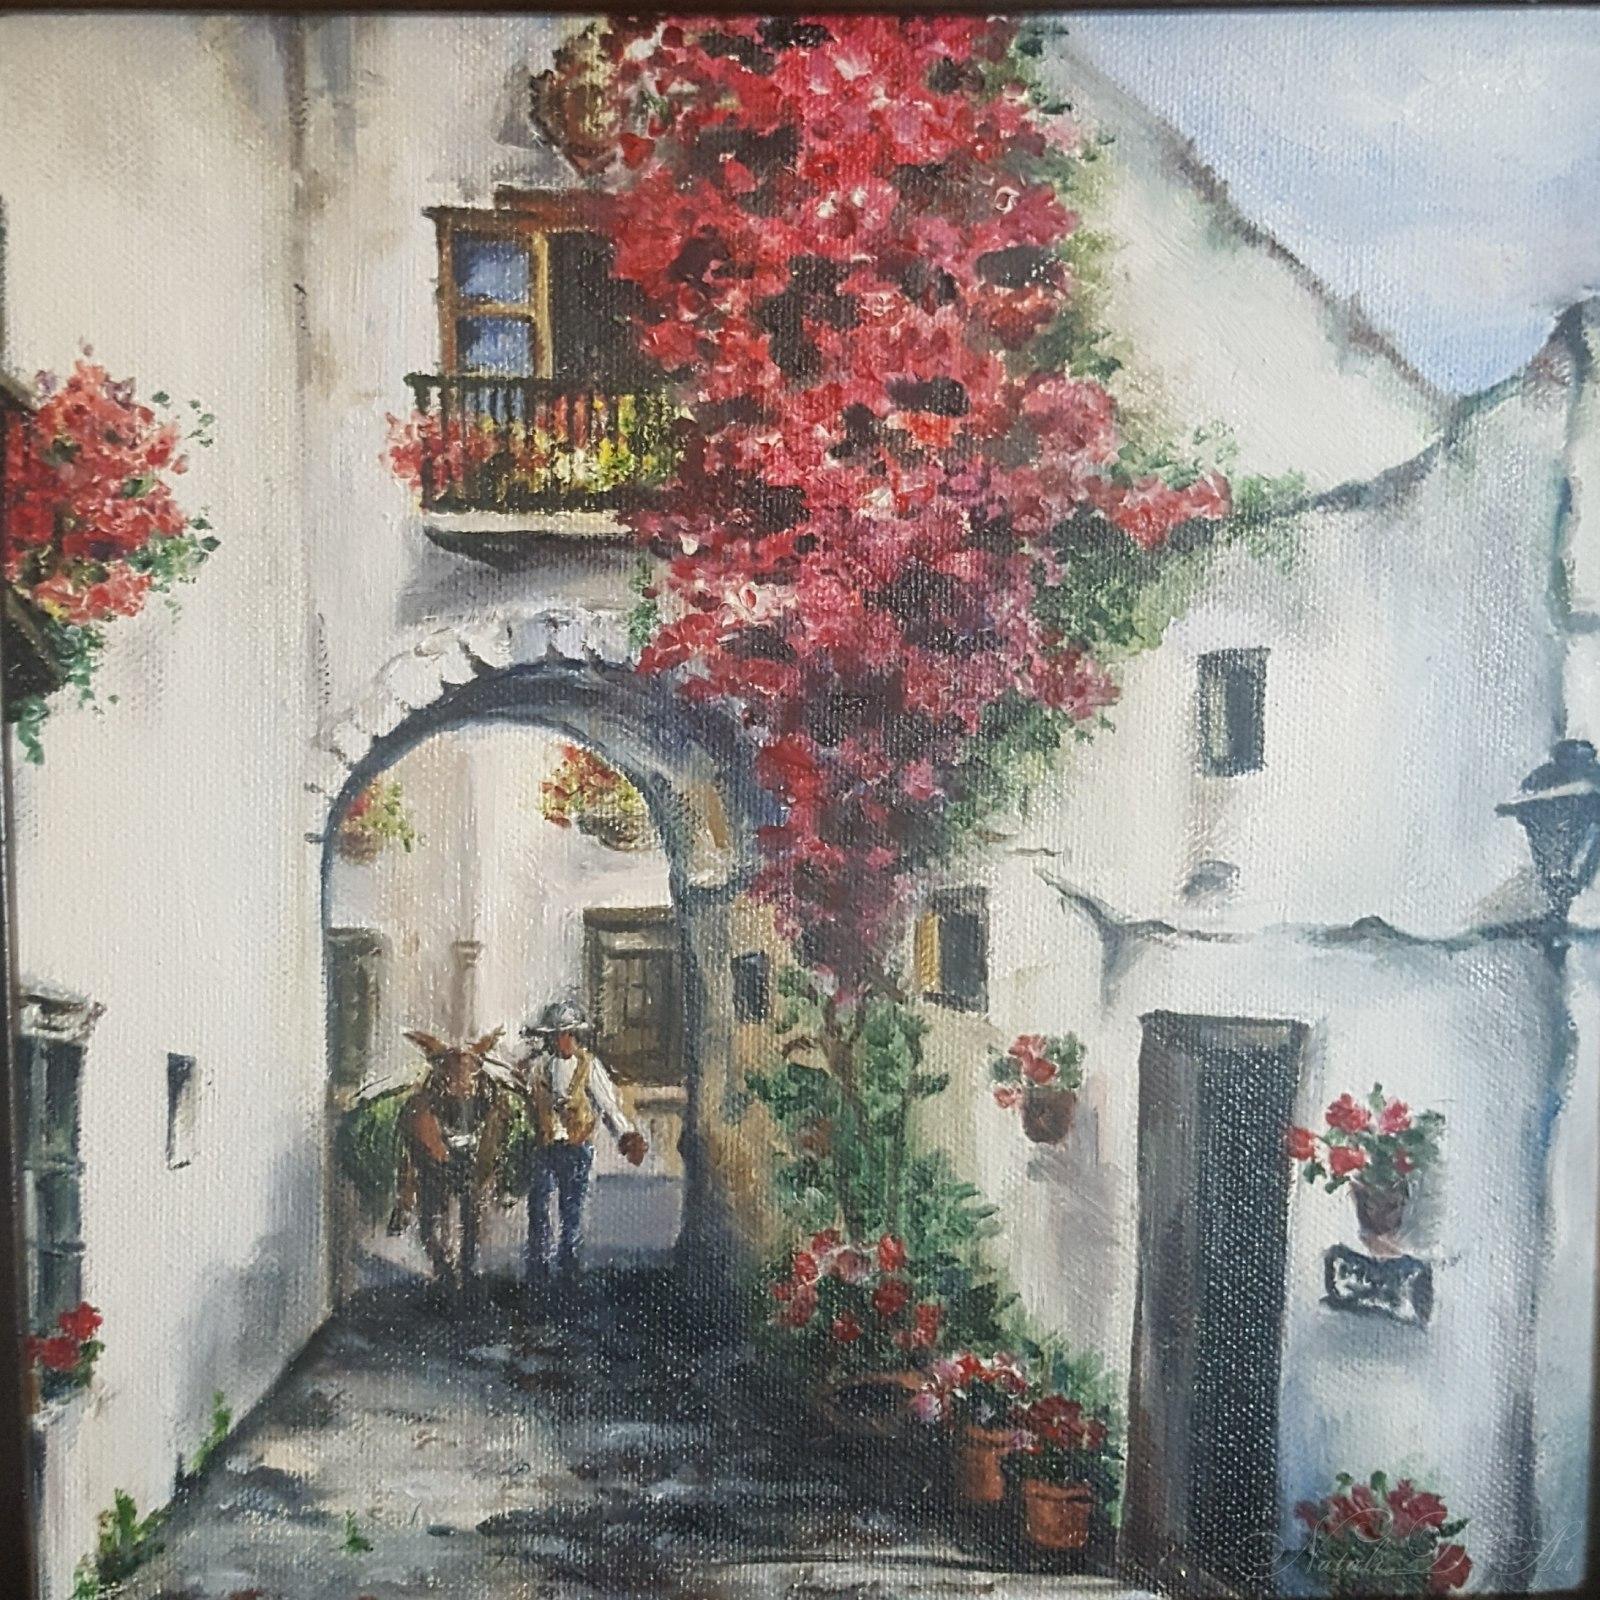 Spanish coutyard